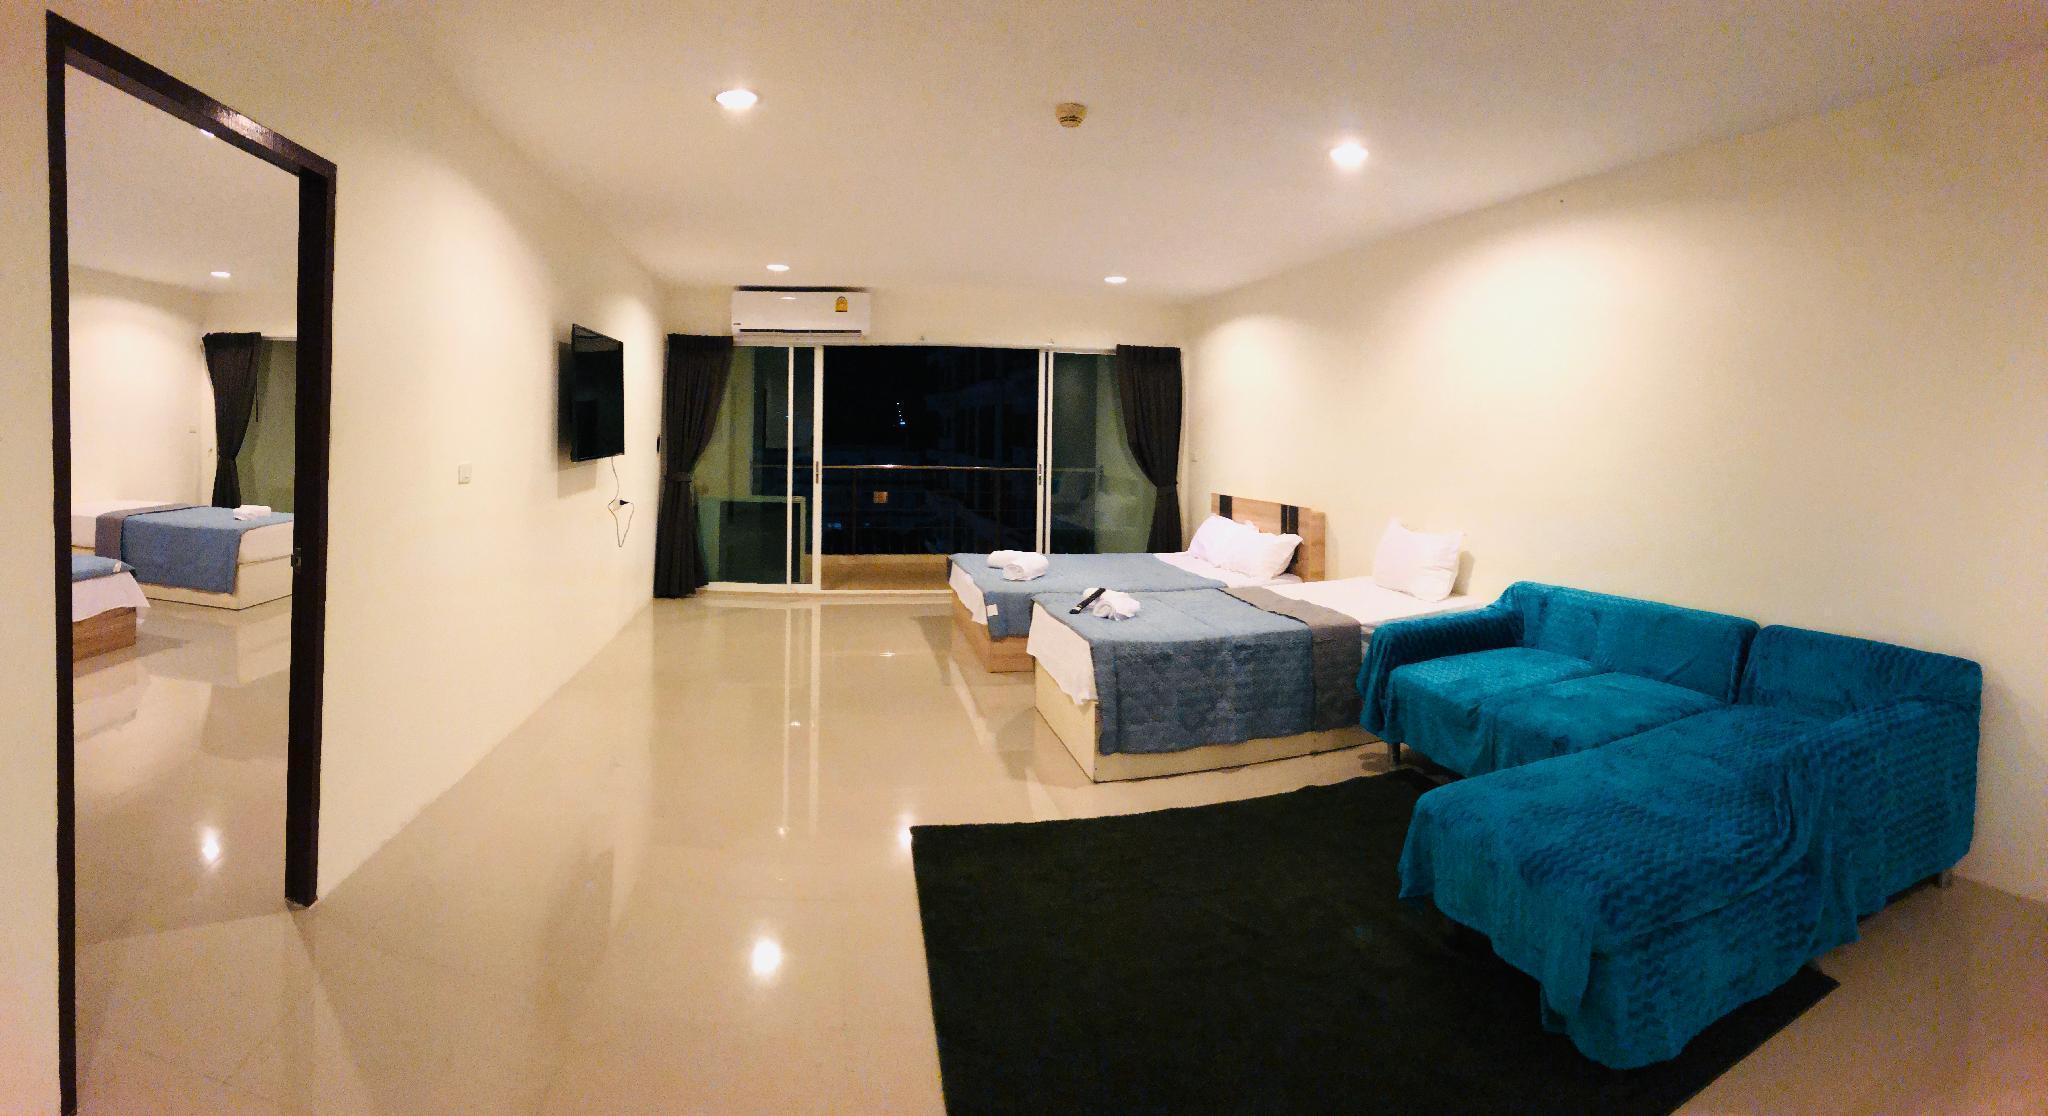 Pattaya two bedroom four bed luxury family room อพาร์ตเมนต์ 2 ห้องนอน 1 ห้องน้ำส่วนตัว ขนาด 110 ตร.ม. – เทพประสิทธิ์